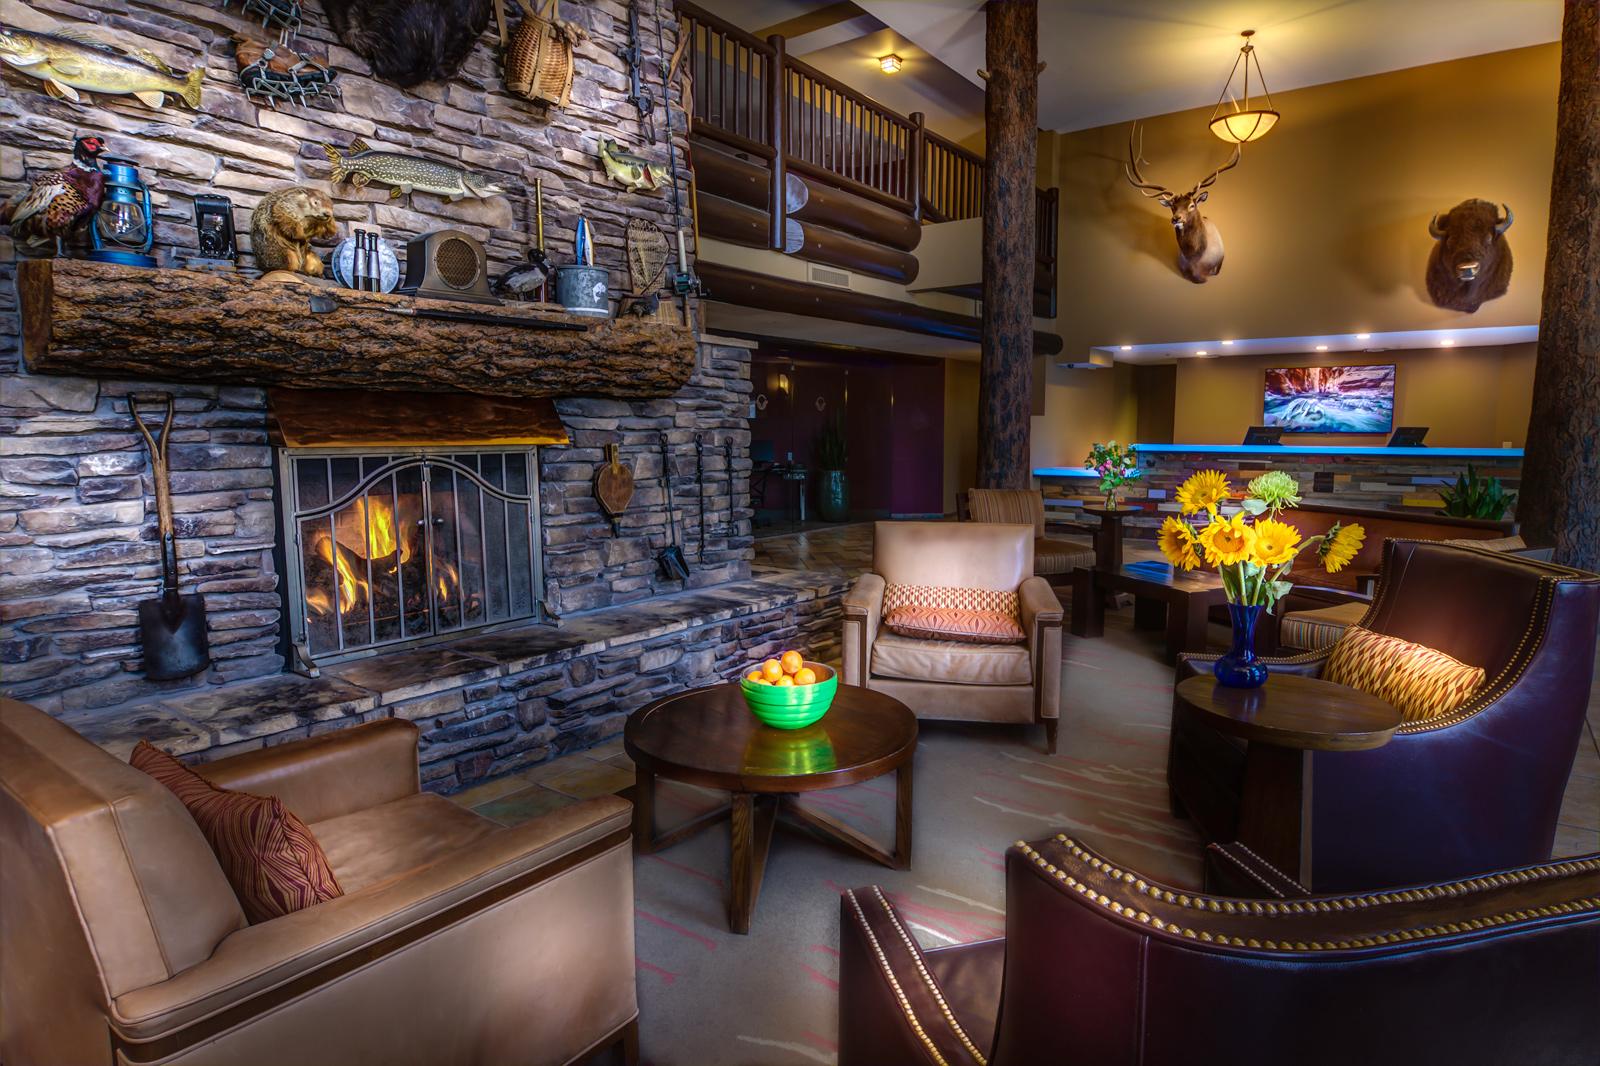 The Grand Hotel Lobby